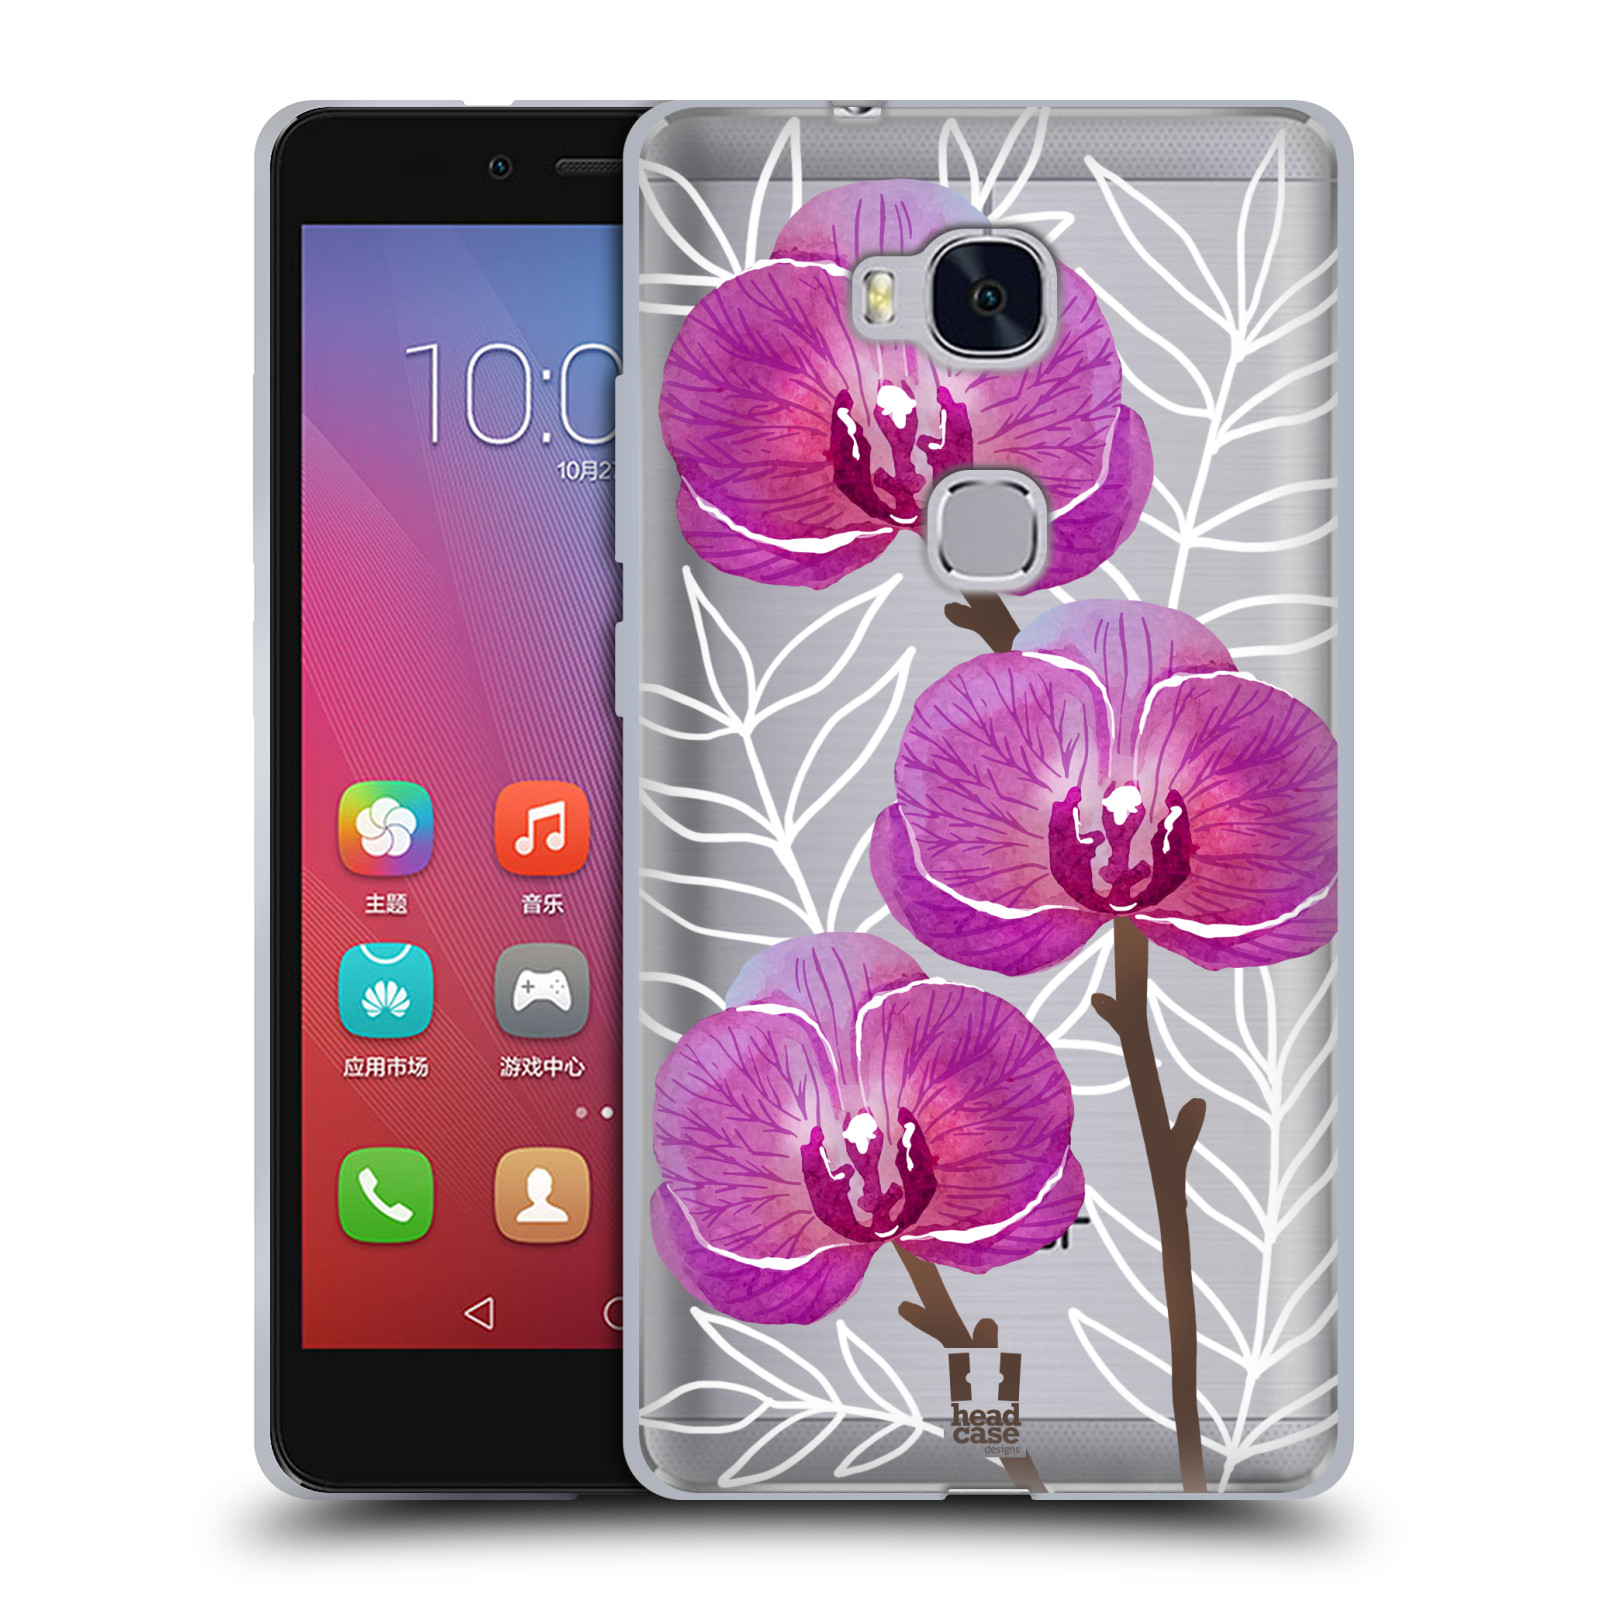 Silikonové pouzdro na mobil Honor 5X - Head Case - Hezoučké kvítky - průhledné